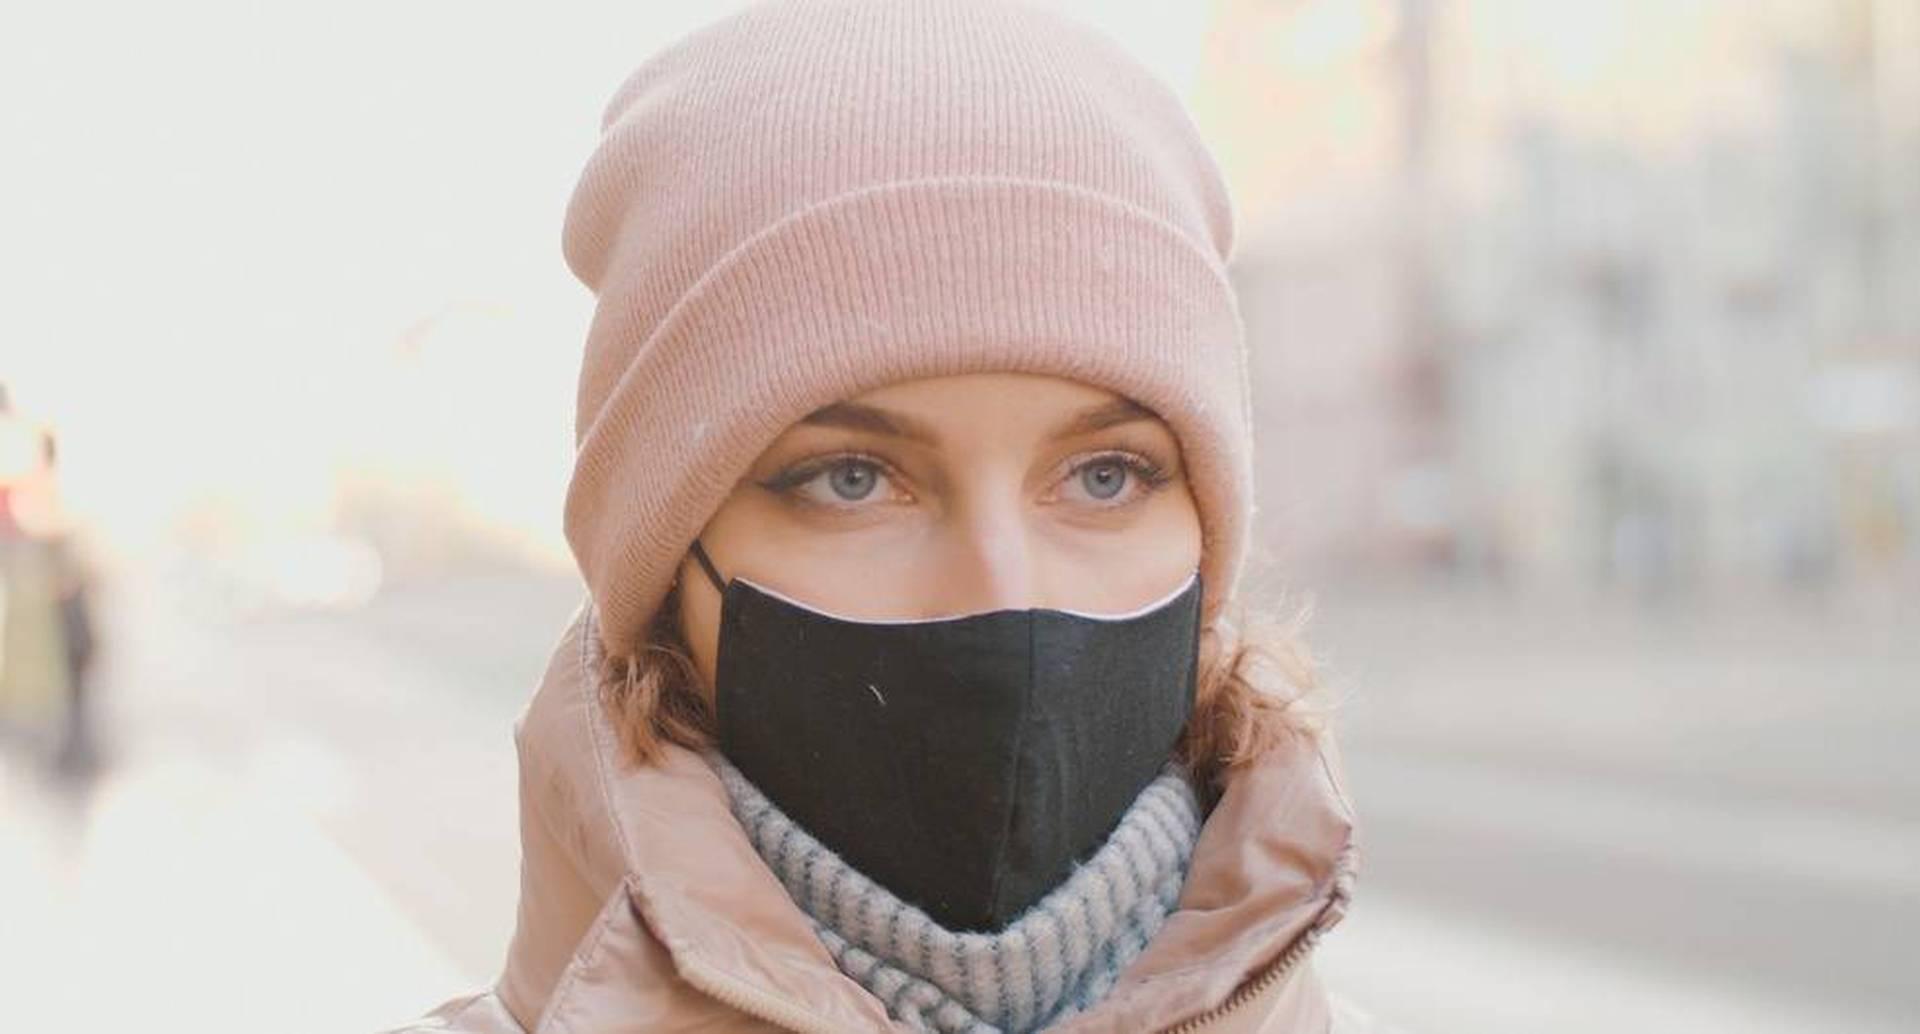 Coronavirus: Nueva Zelanda erradica la pandemia en su territorio